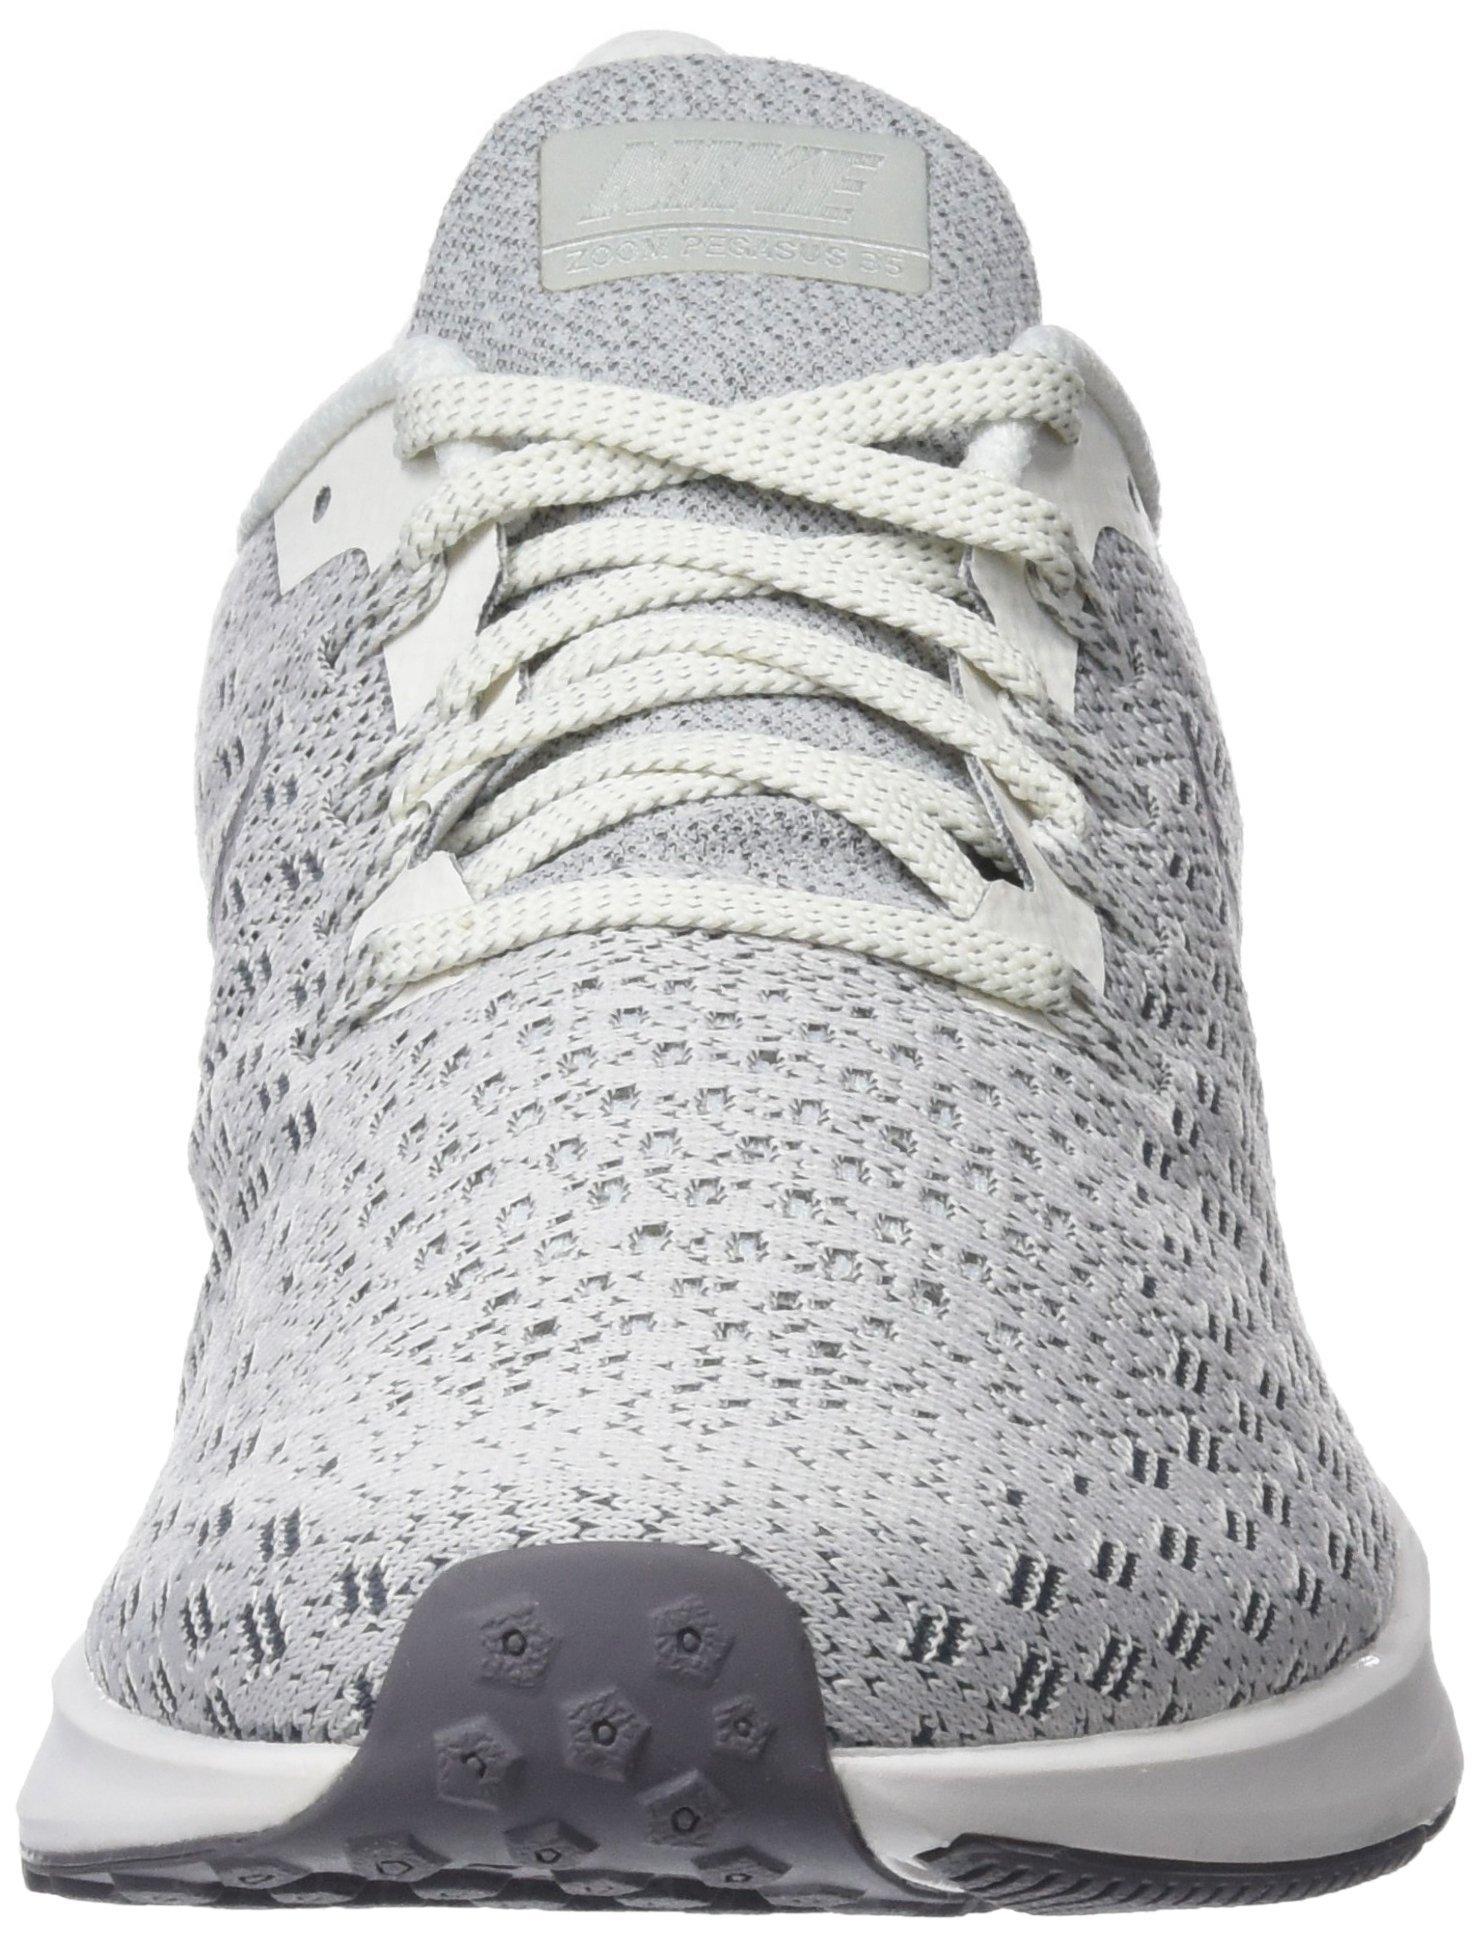 Nike Air Zoom Pegasus 35 Mens 942851-004 Size 6.5 by Nike (Image #4)